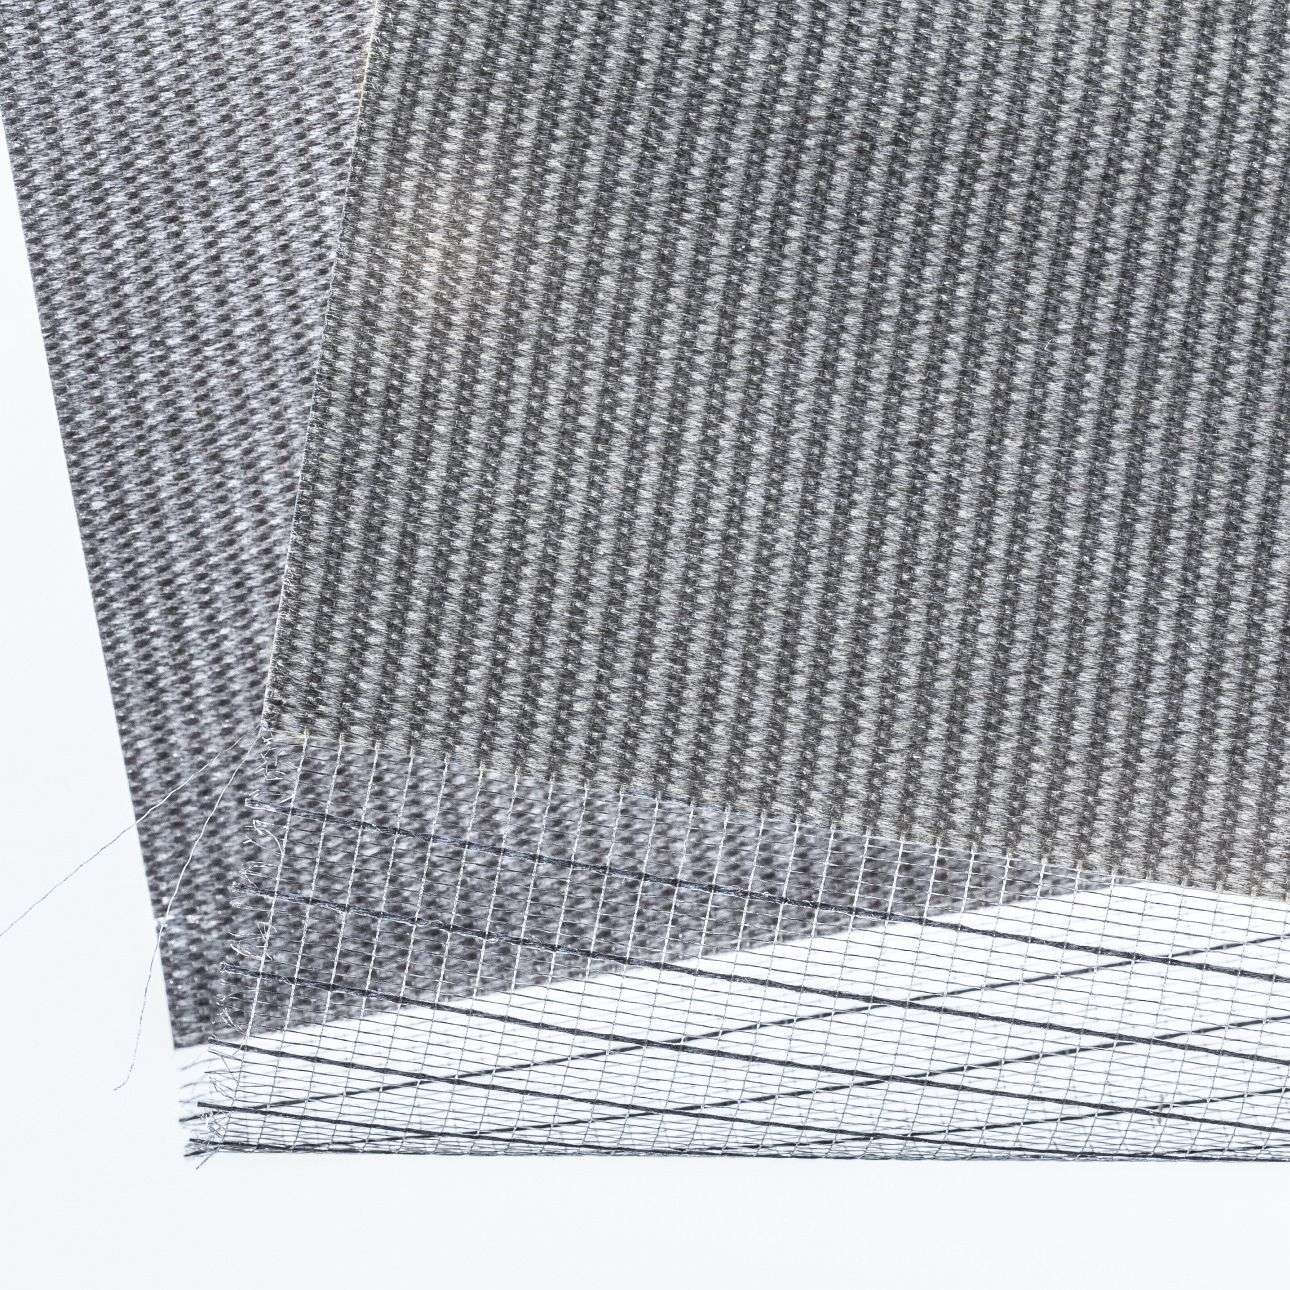 Mini-Doppelrollo 38x150cm von der Kollektion Doppelrollos, Stoff: 1220